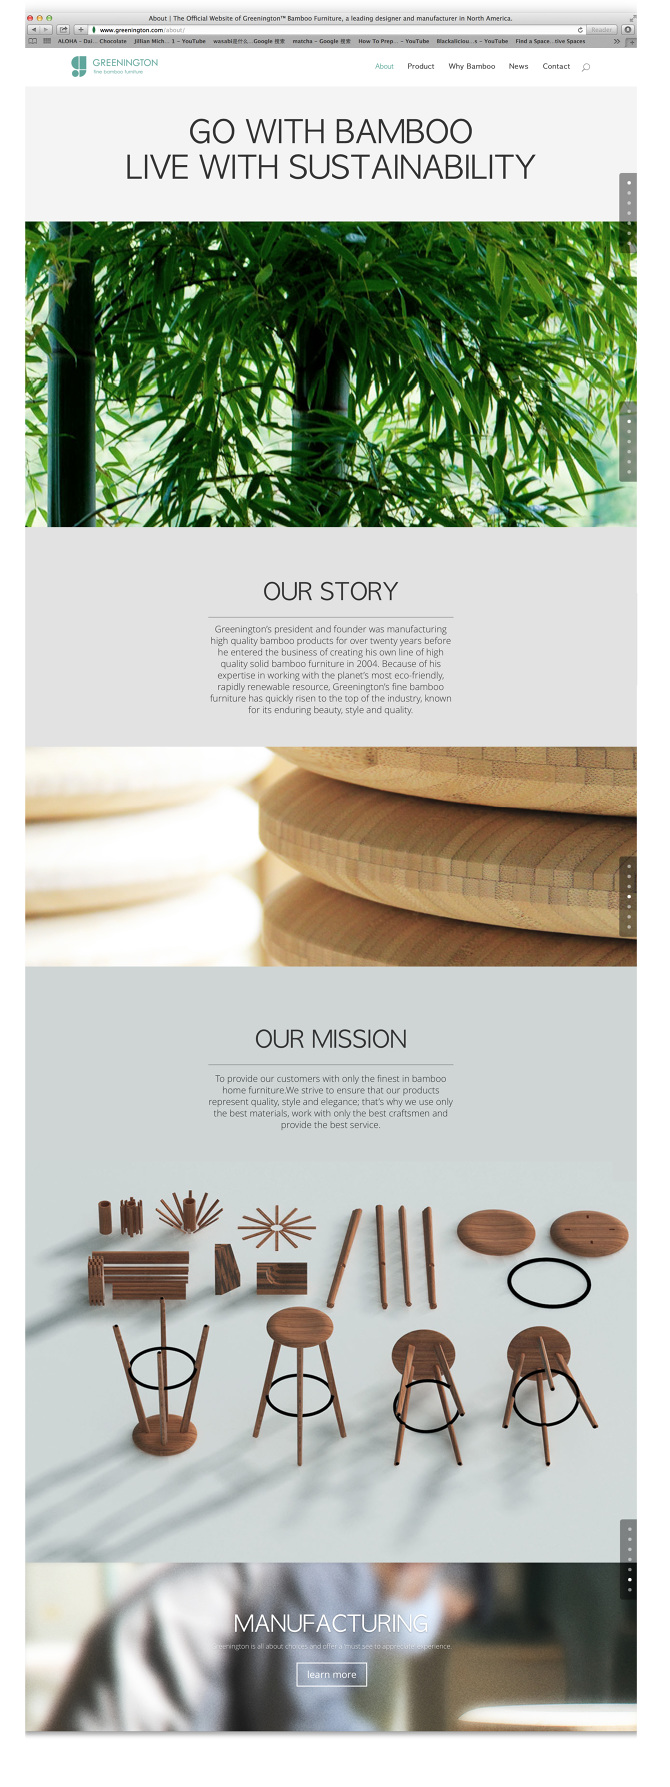 Flow Chart. 2014 (668 Views) Filed Under Digital, Branding · Greenington  Fine Bamboo Furniture